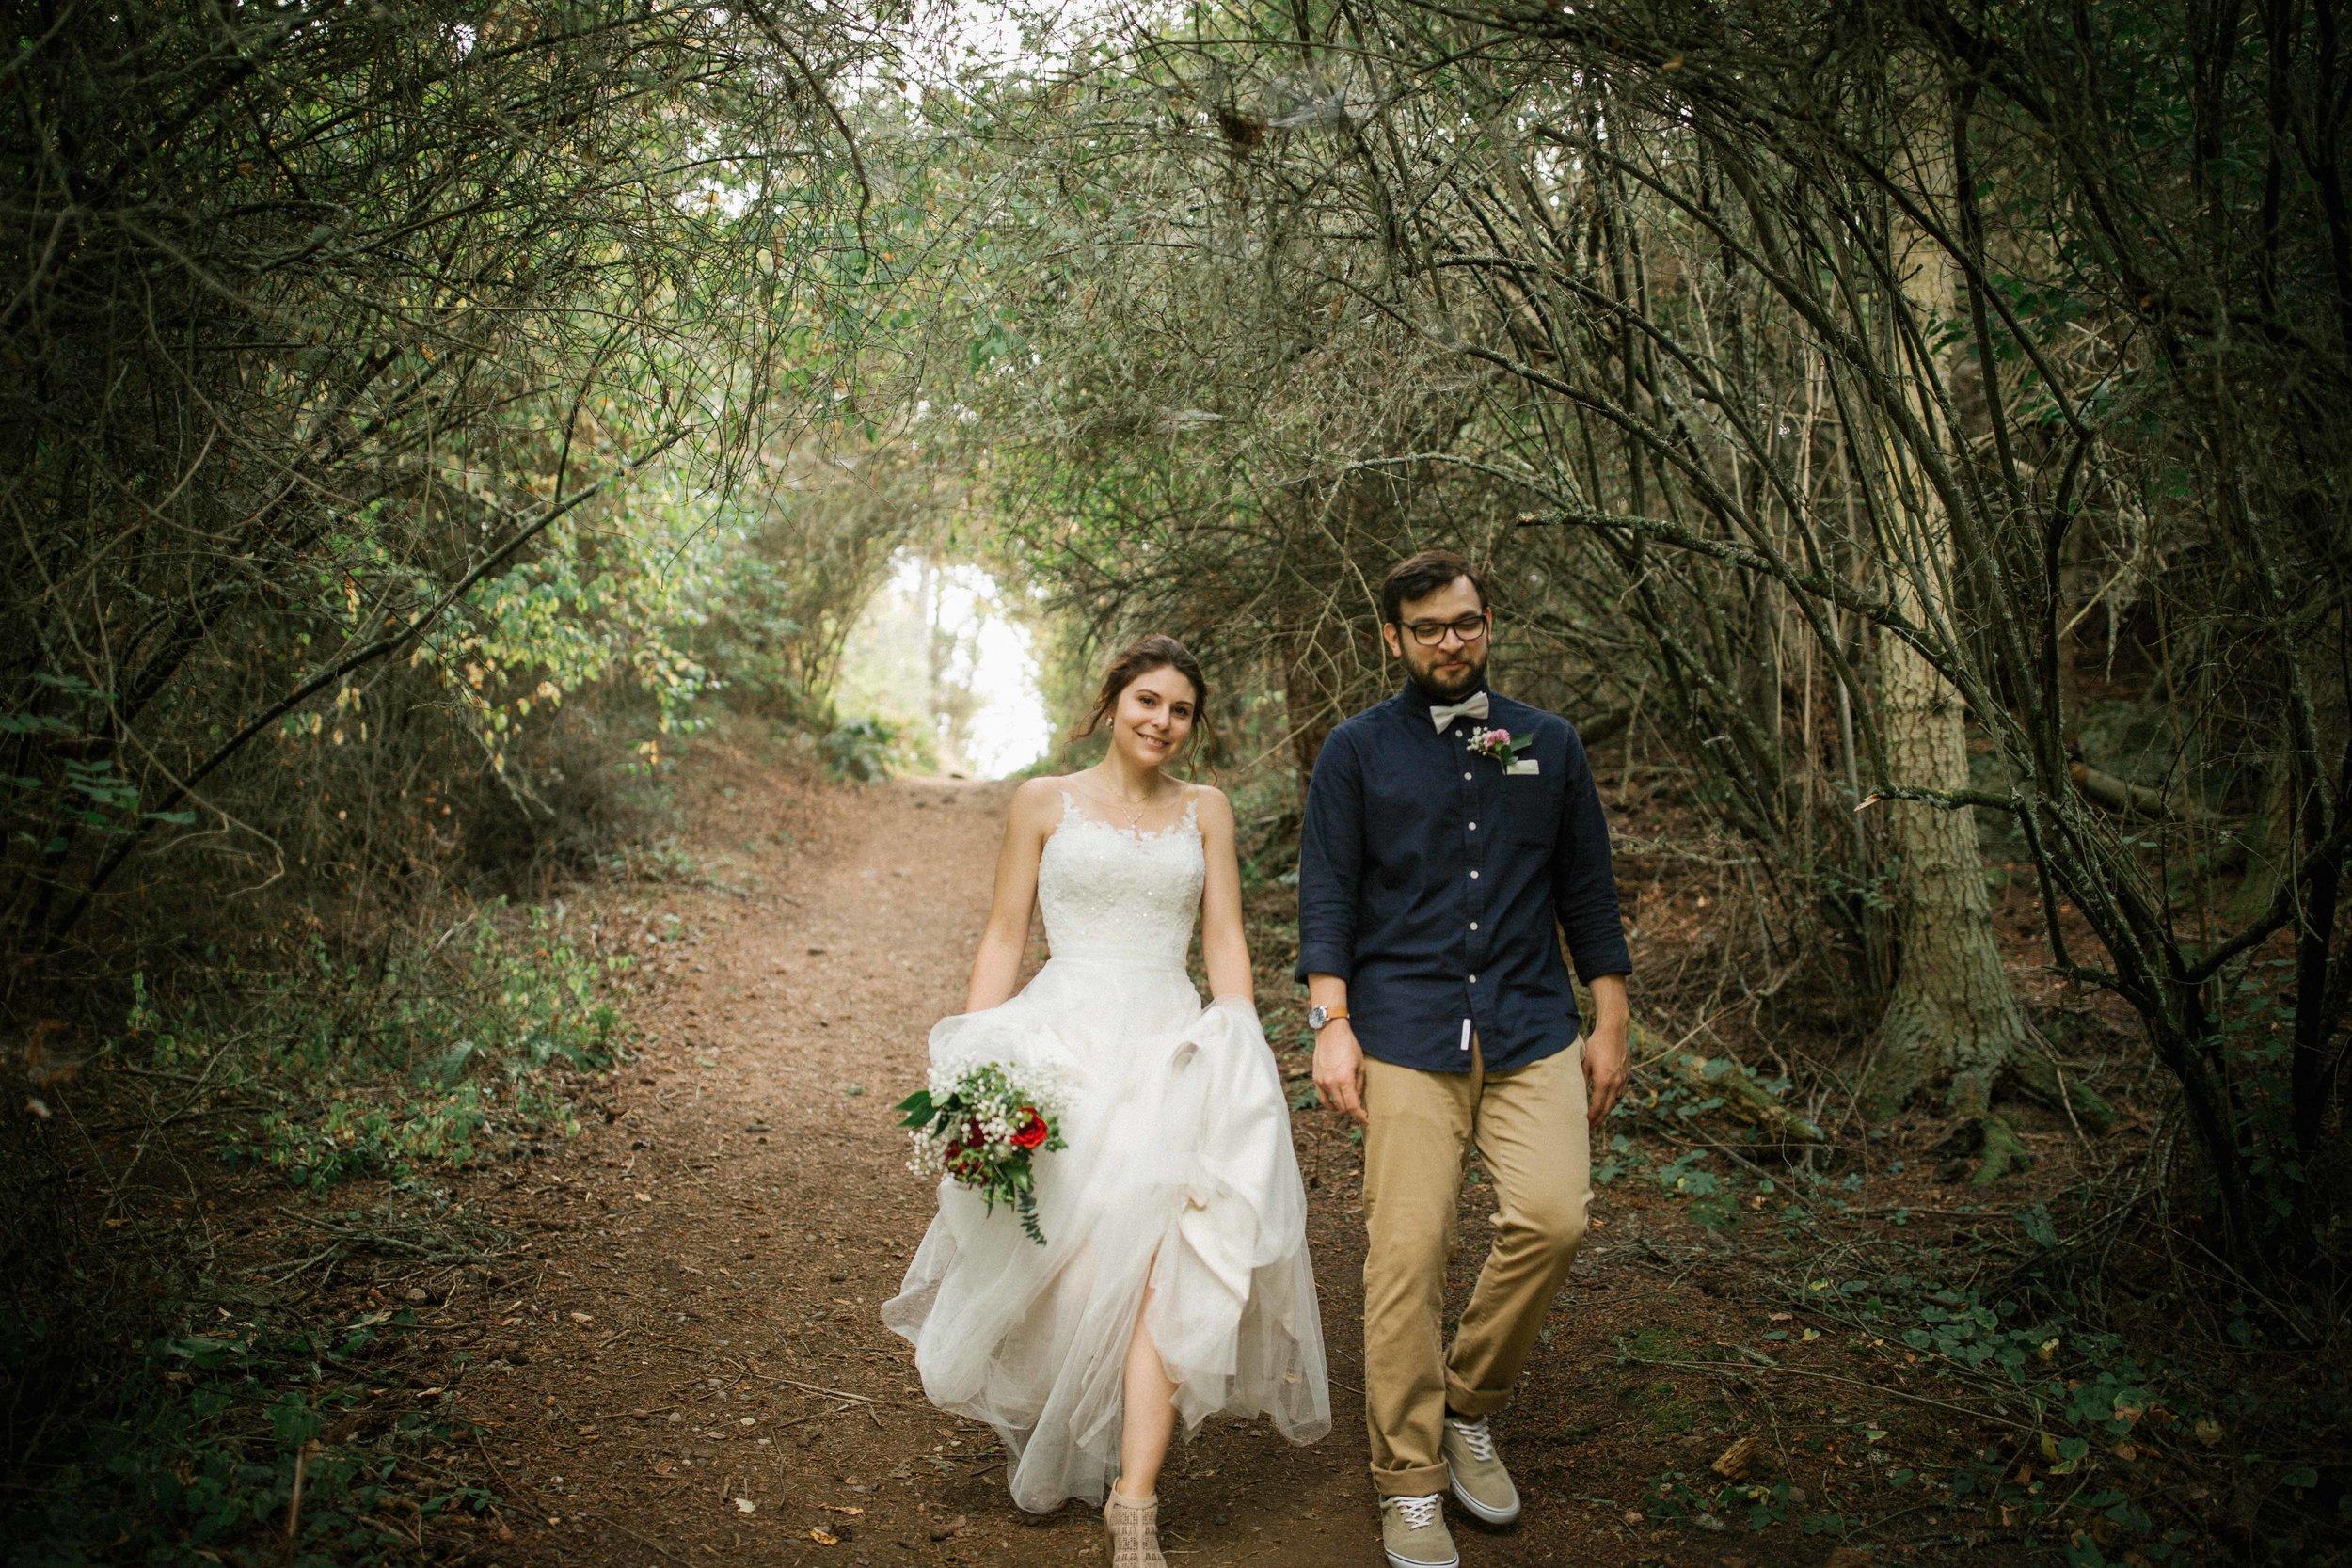 deception-pass-wedding-52.jpg